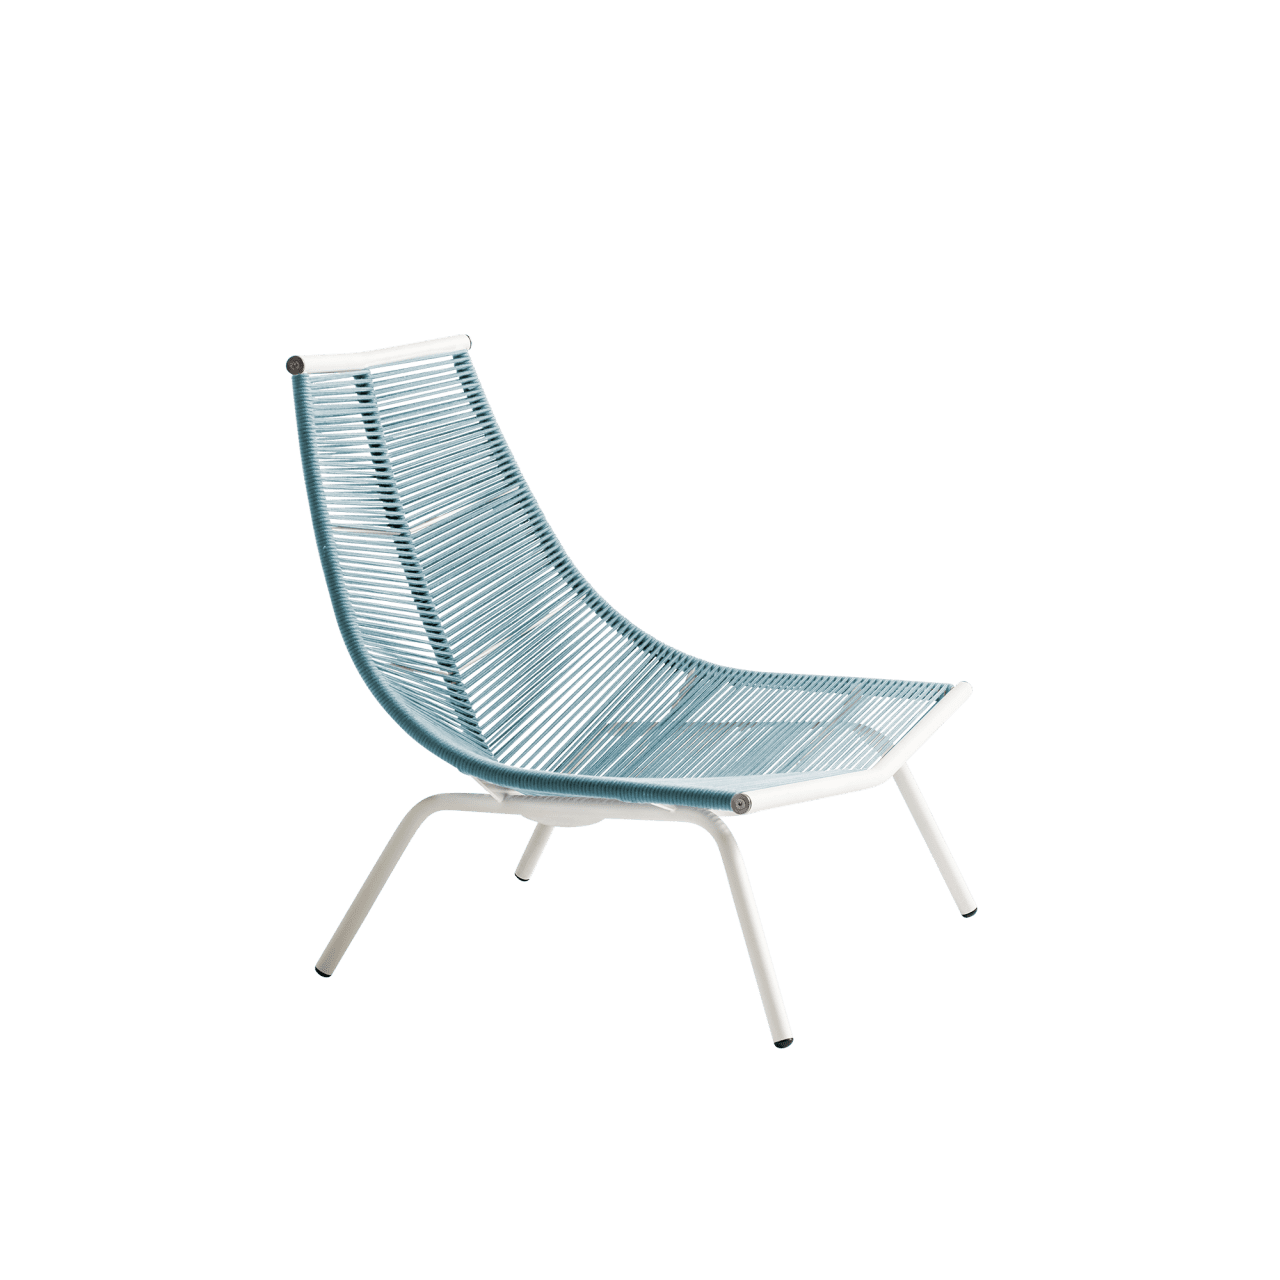 Laze hoher Outdoor Sessel